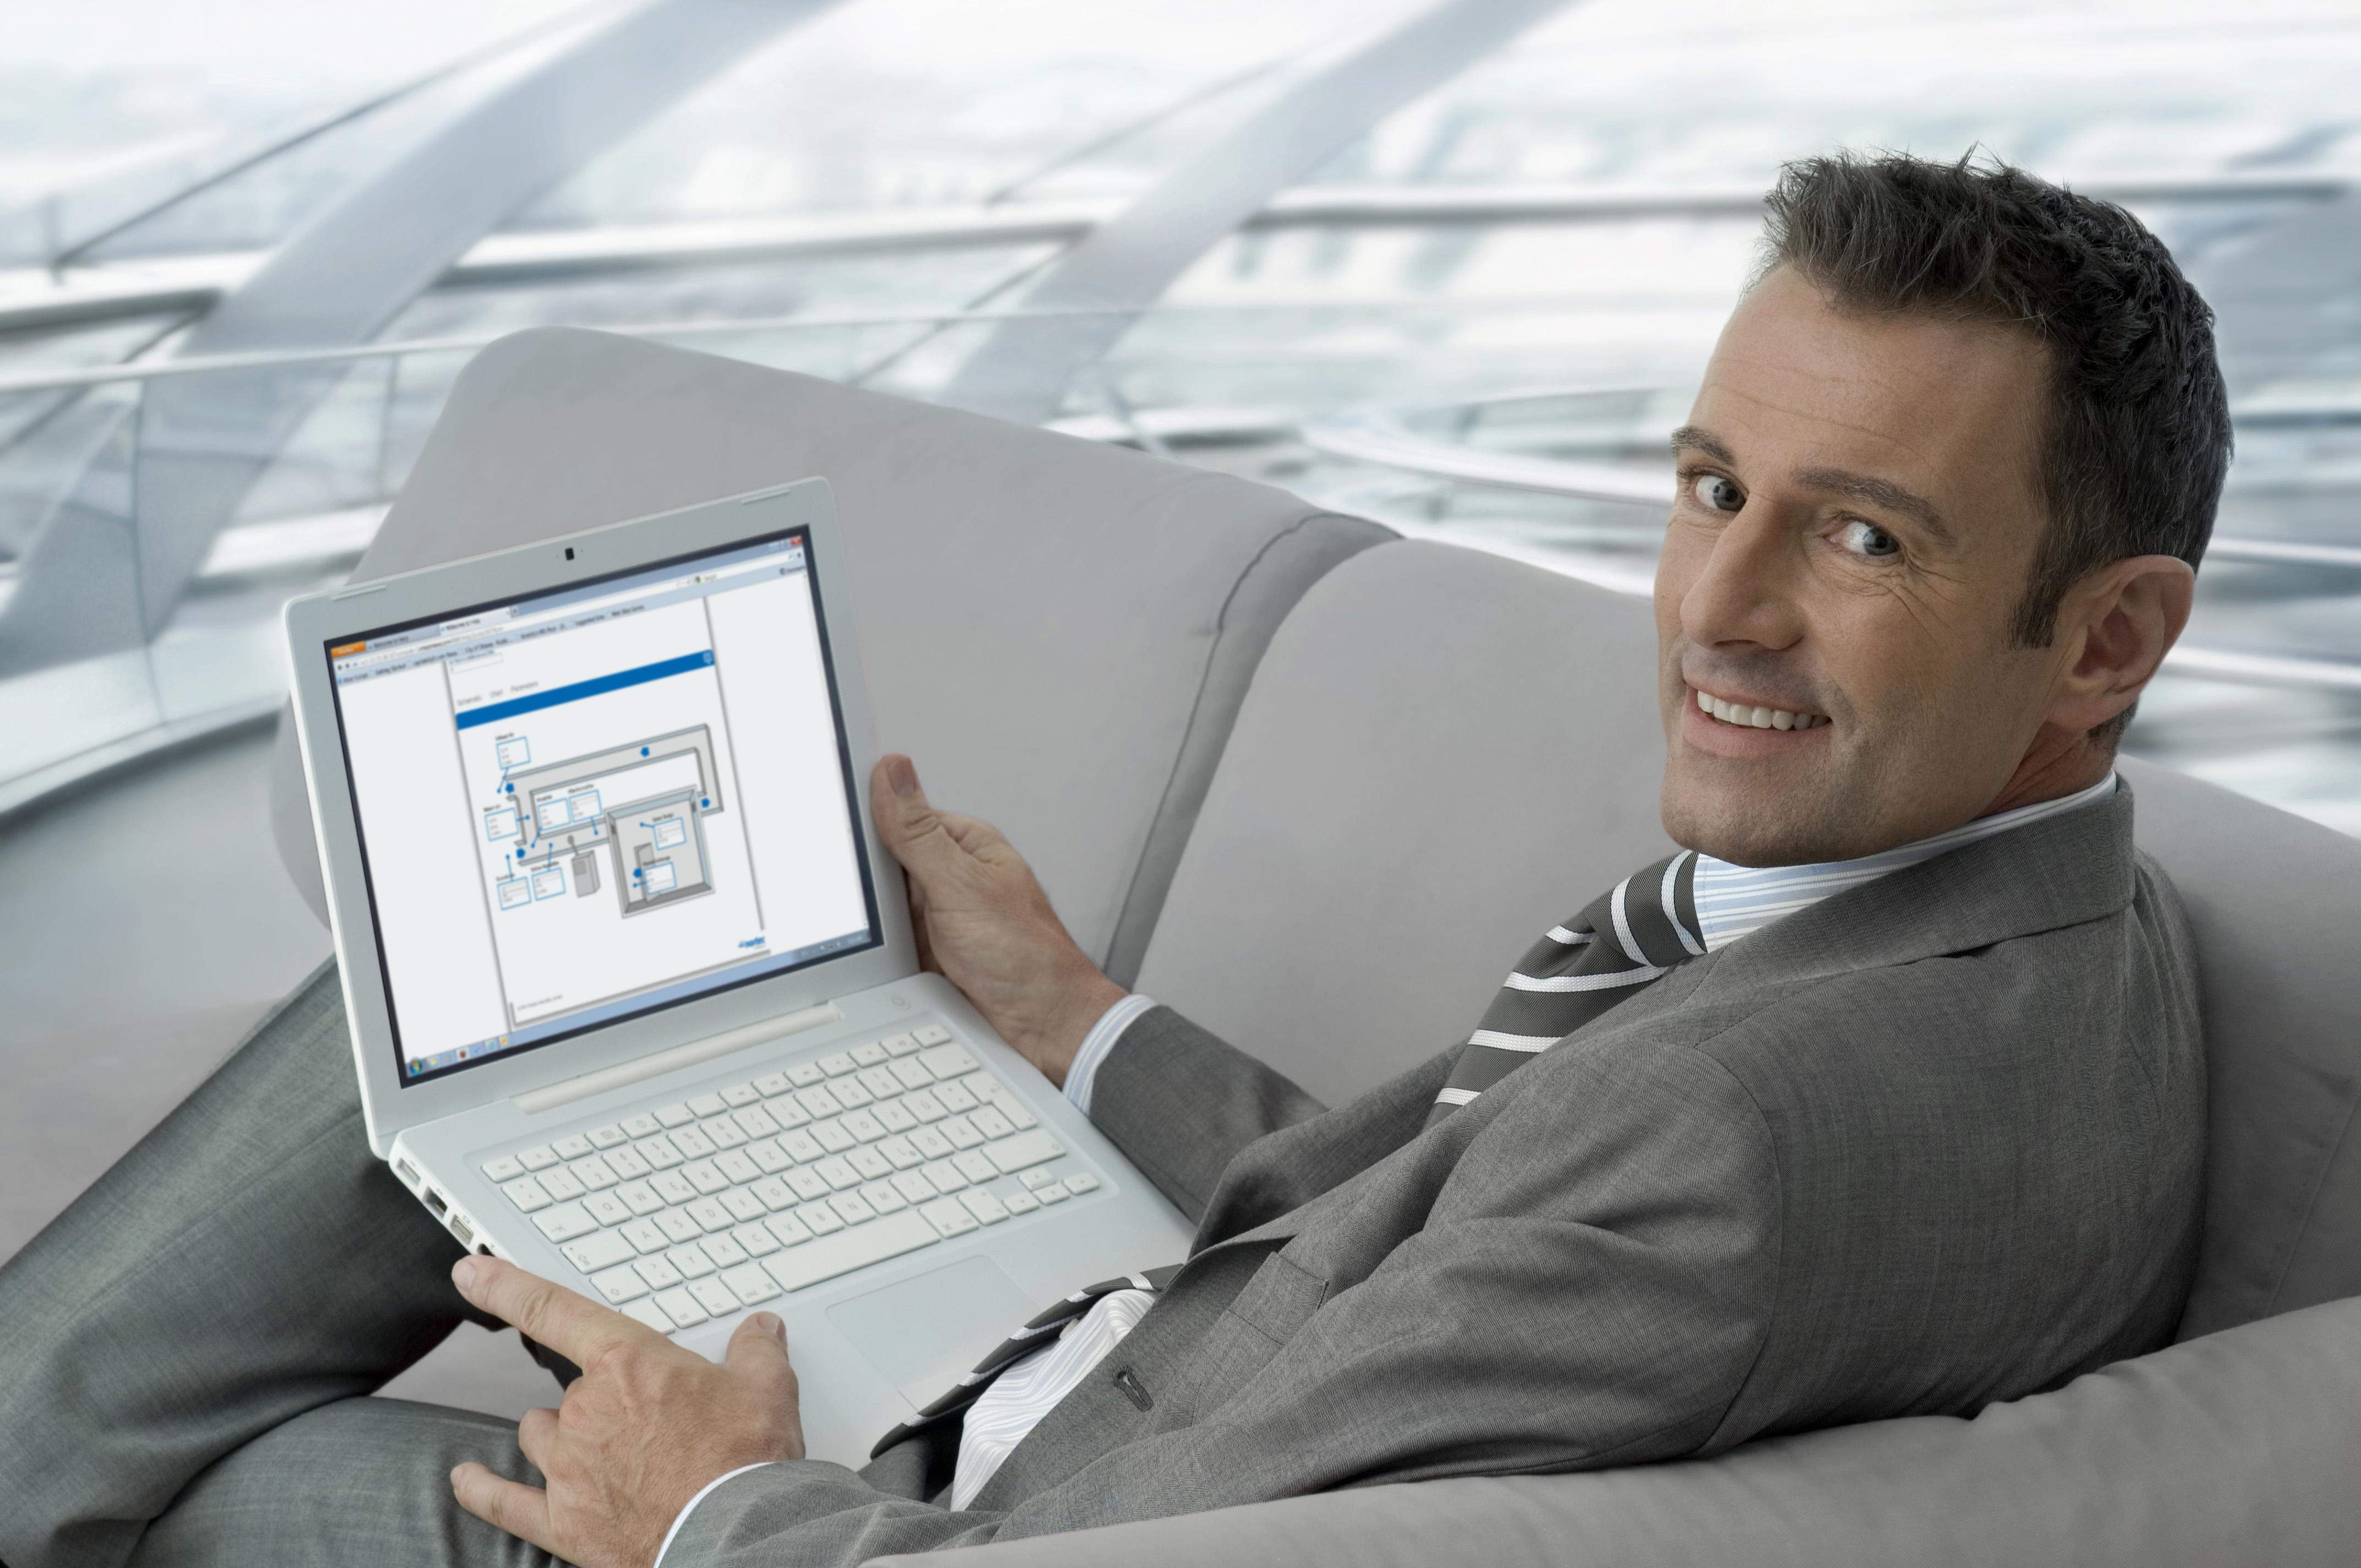 Condair's Help Software